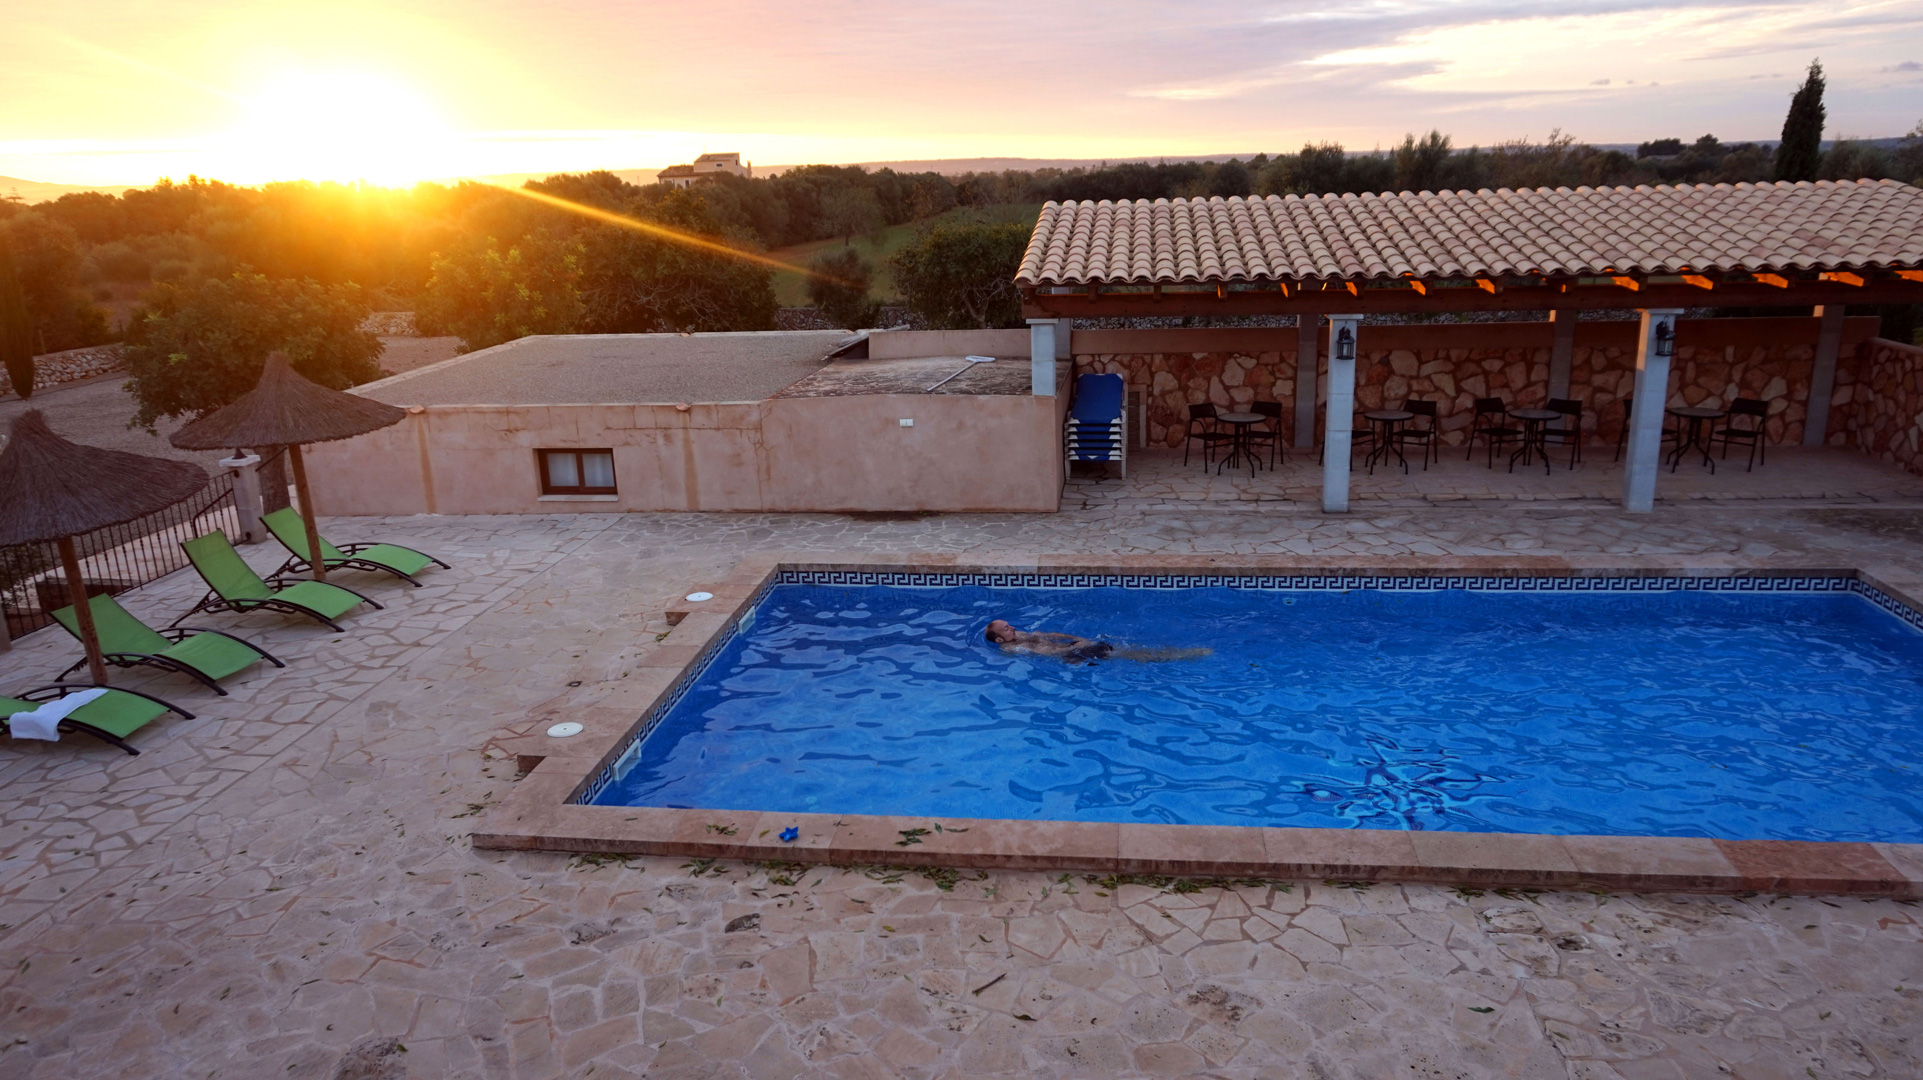 Morgendliches Bad im Pool des Ferienhauses